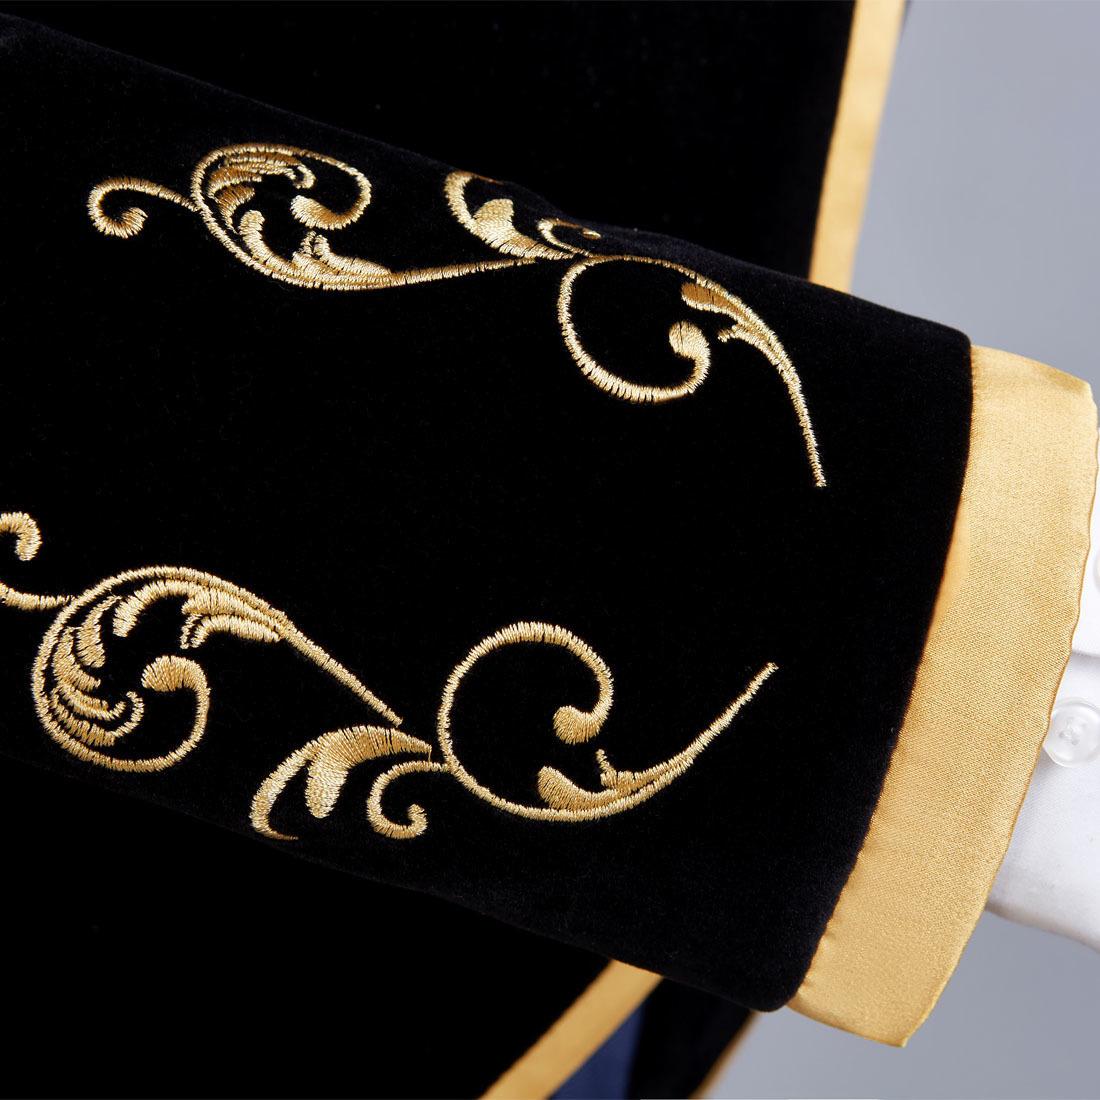 Pyjtrl British Style Palace Prince Fashion Black Velvet Gold Embroidery Blazer Wedding Groom Slim Fit Suit Jacket Singers Coat Q190427